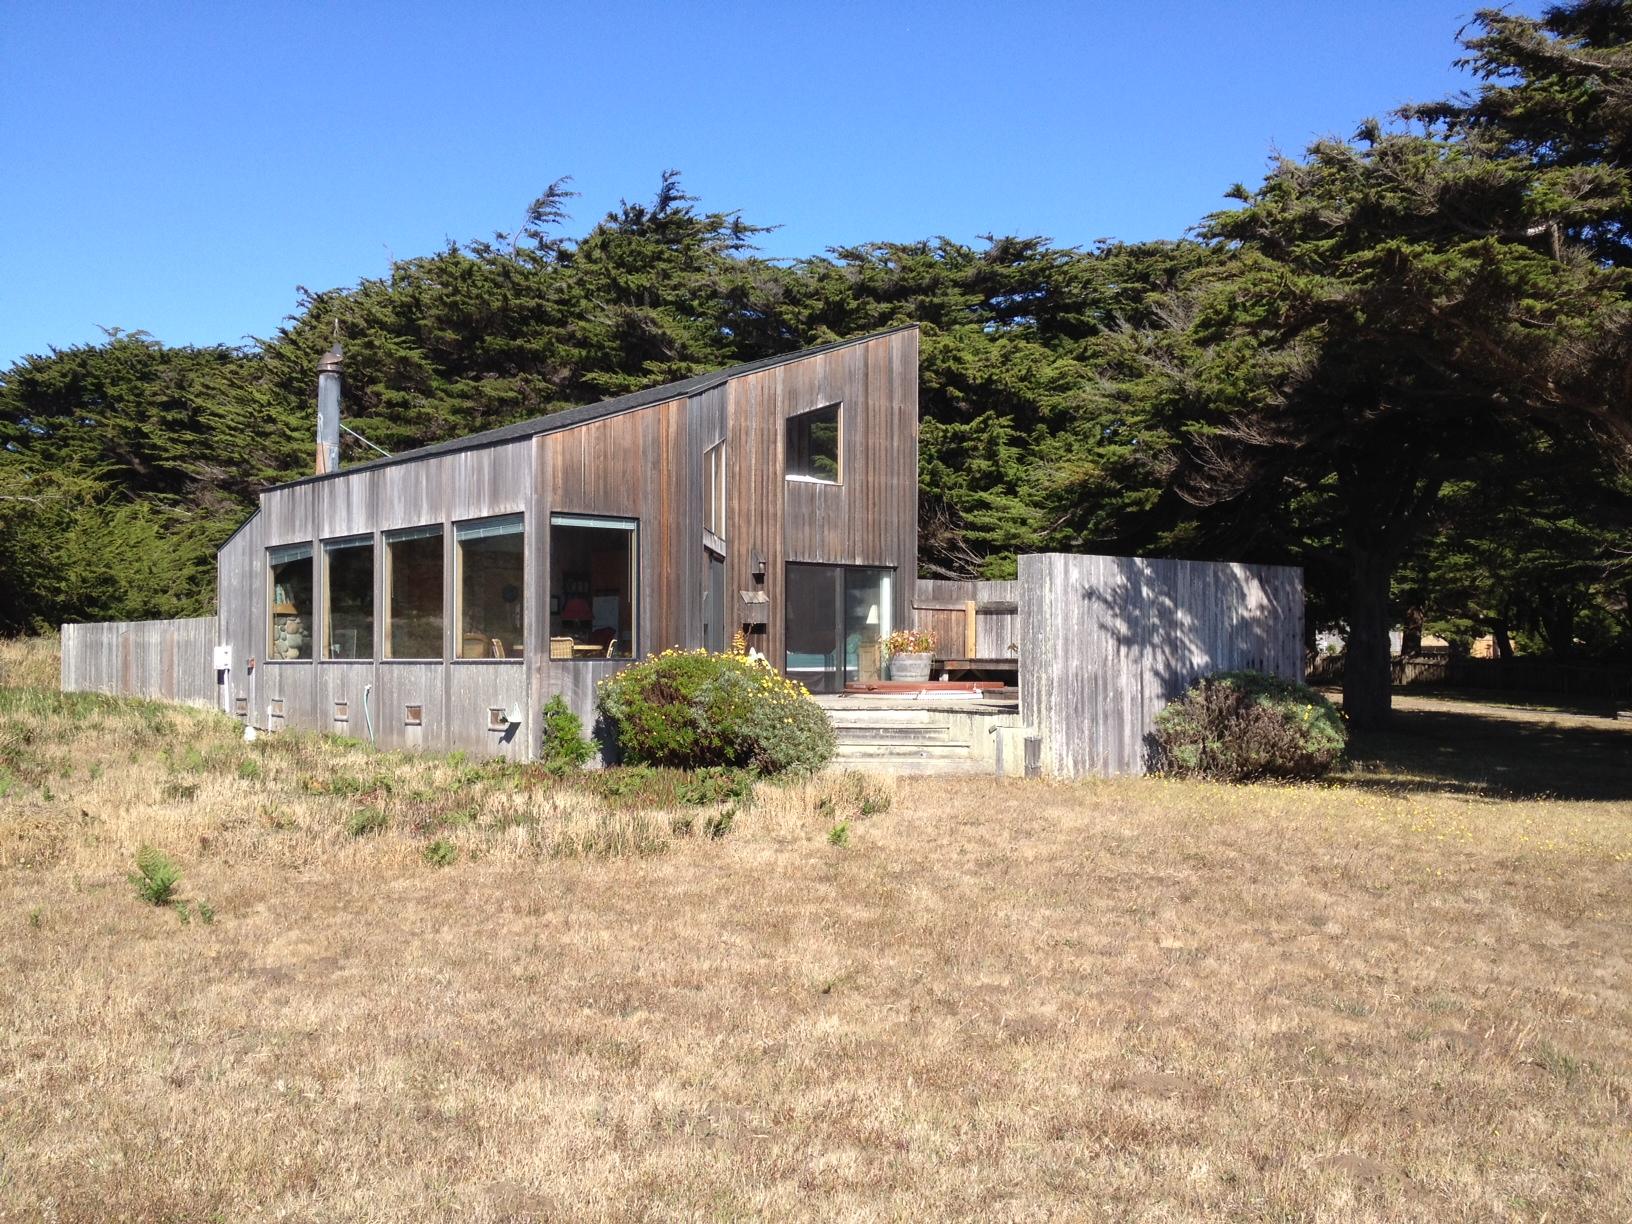 Sea ranch house peggy osterkamp 39 s weaving blogpeggy for Ranch house blog